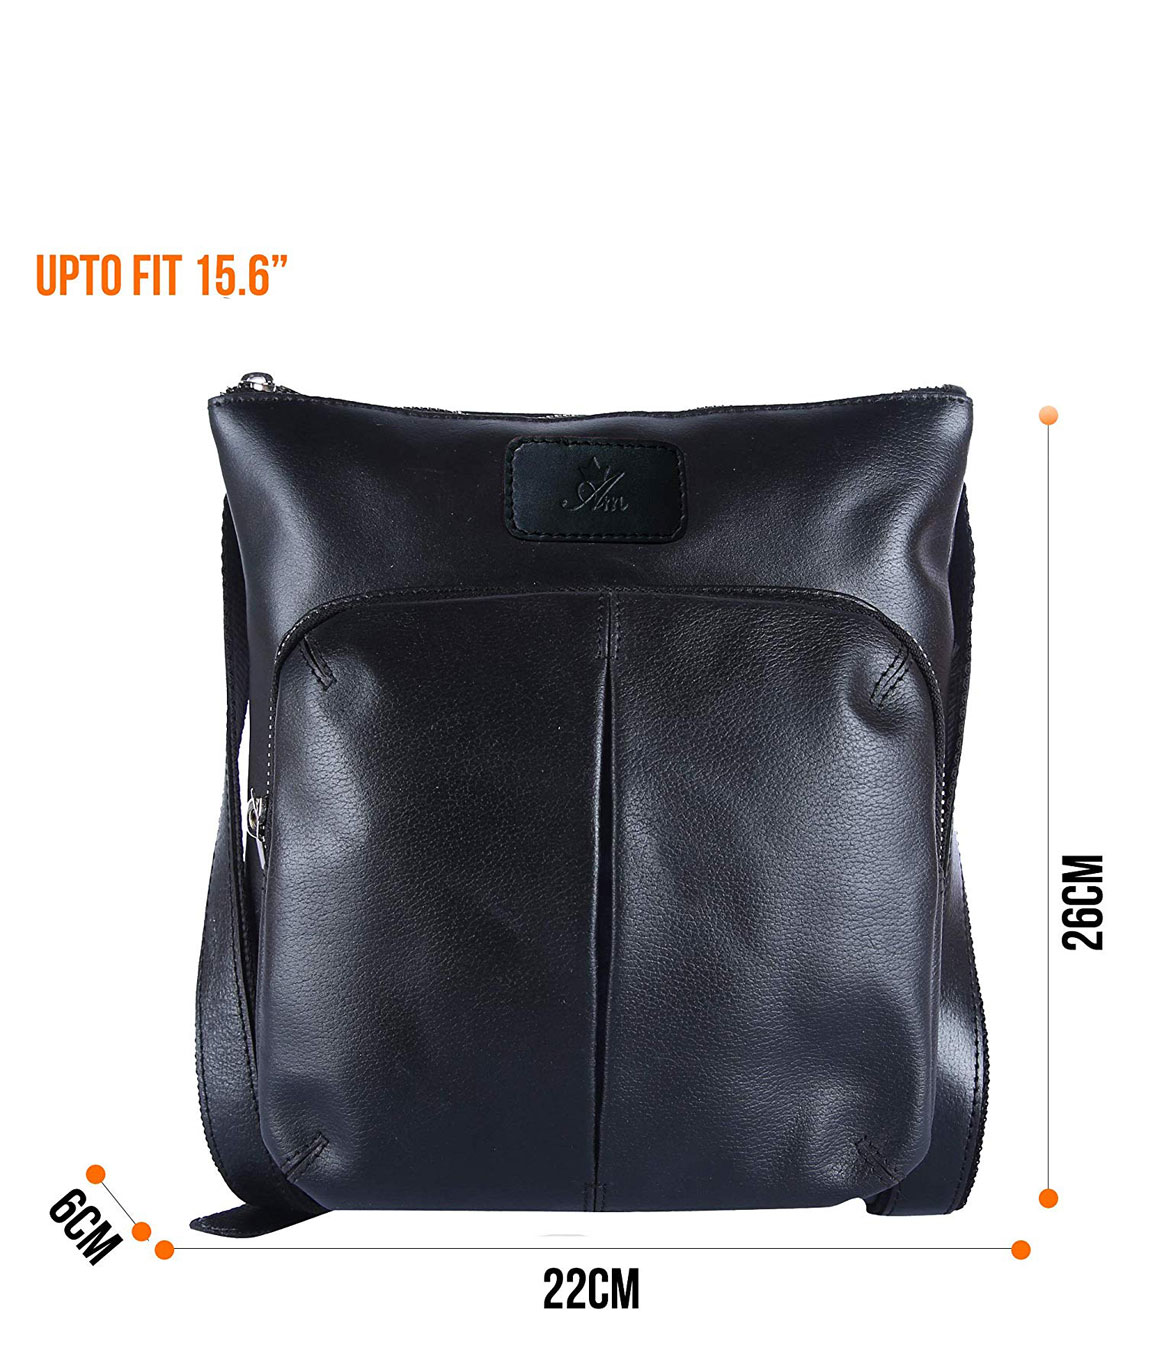 AM LEATHER Black Colour Genuine Leather Unisex Messenger Bag